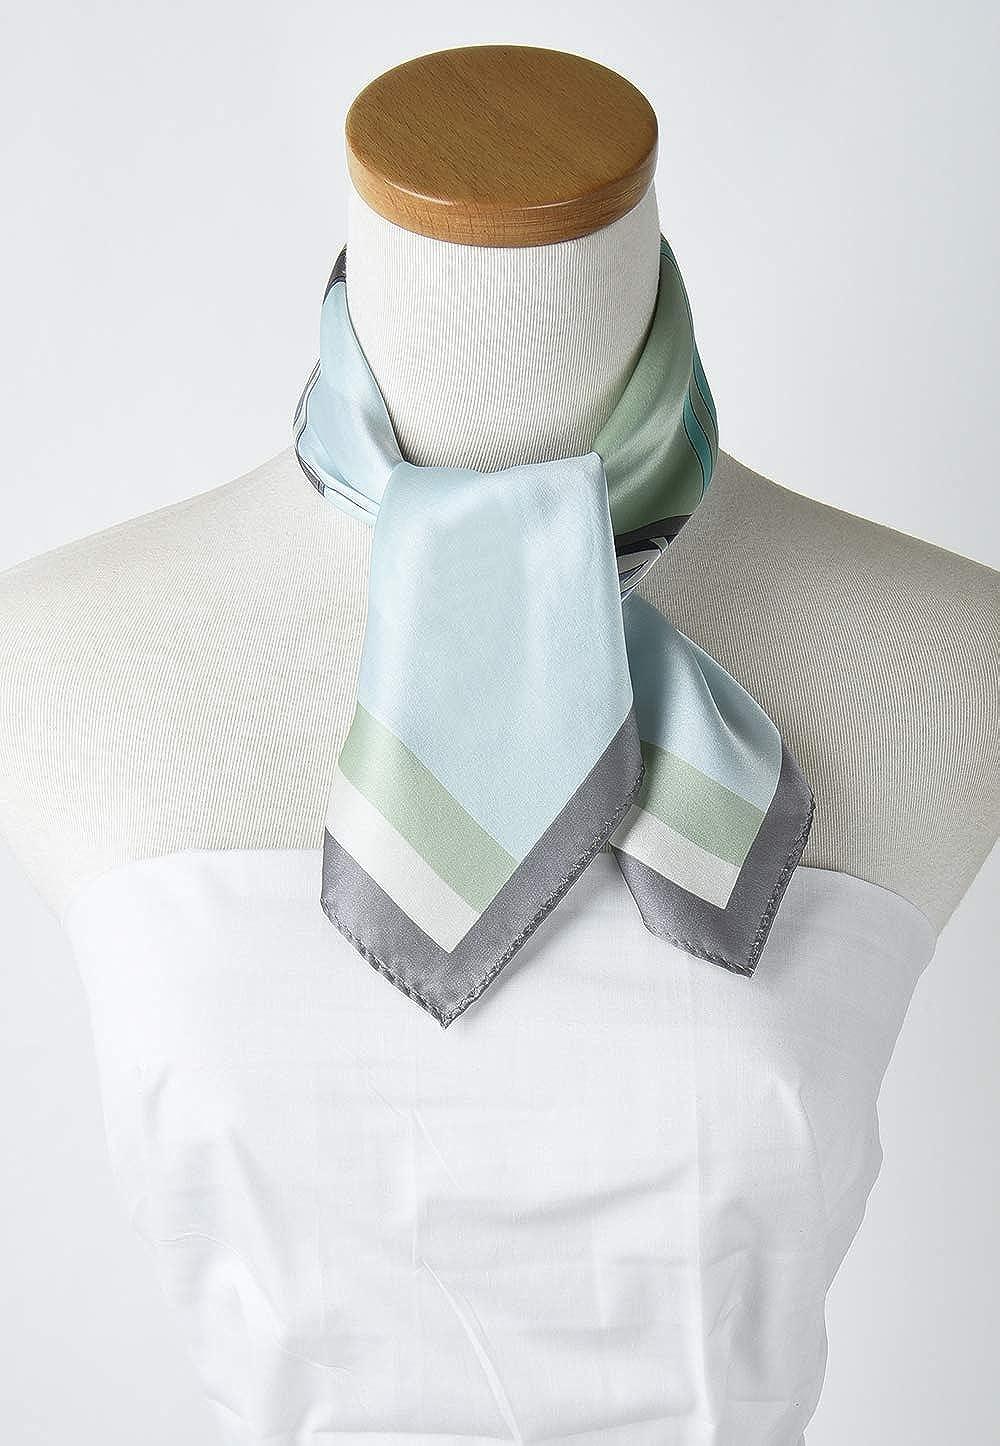 21 Inch Corciova 100/% Real Satin Small Square Silk Neck Scarf Scarves Neckerchiefs